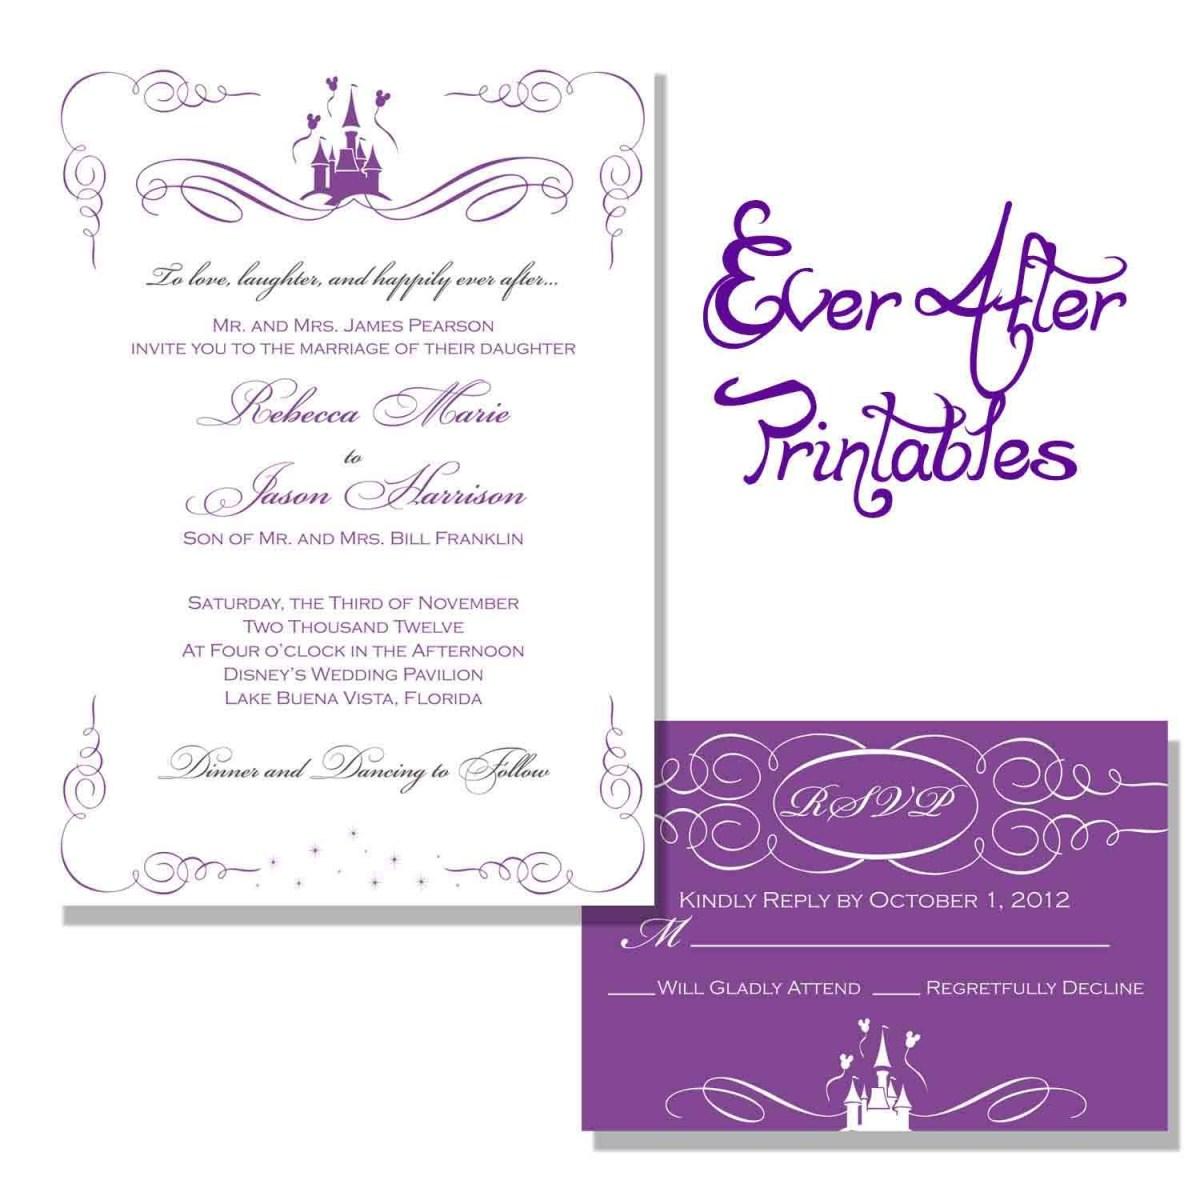 Disney Wedding Invitations Wedding Invitation Wording Wording Getting Hitched Disney